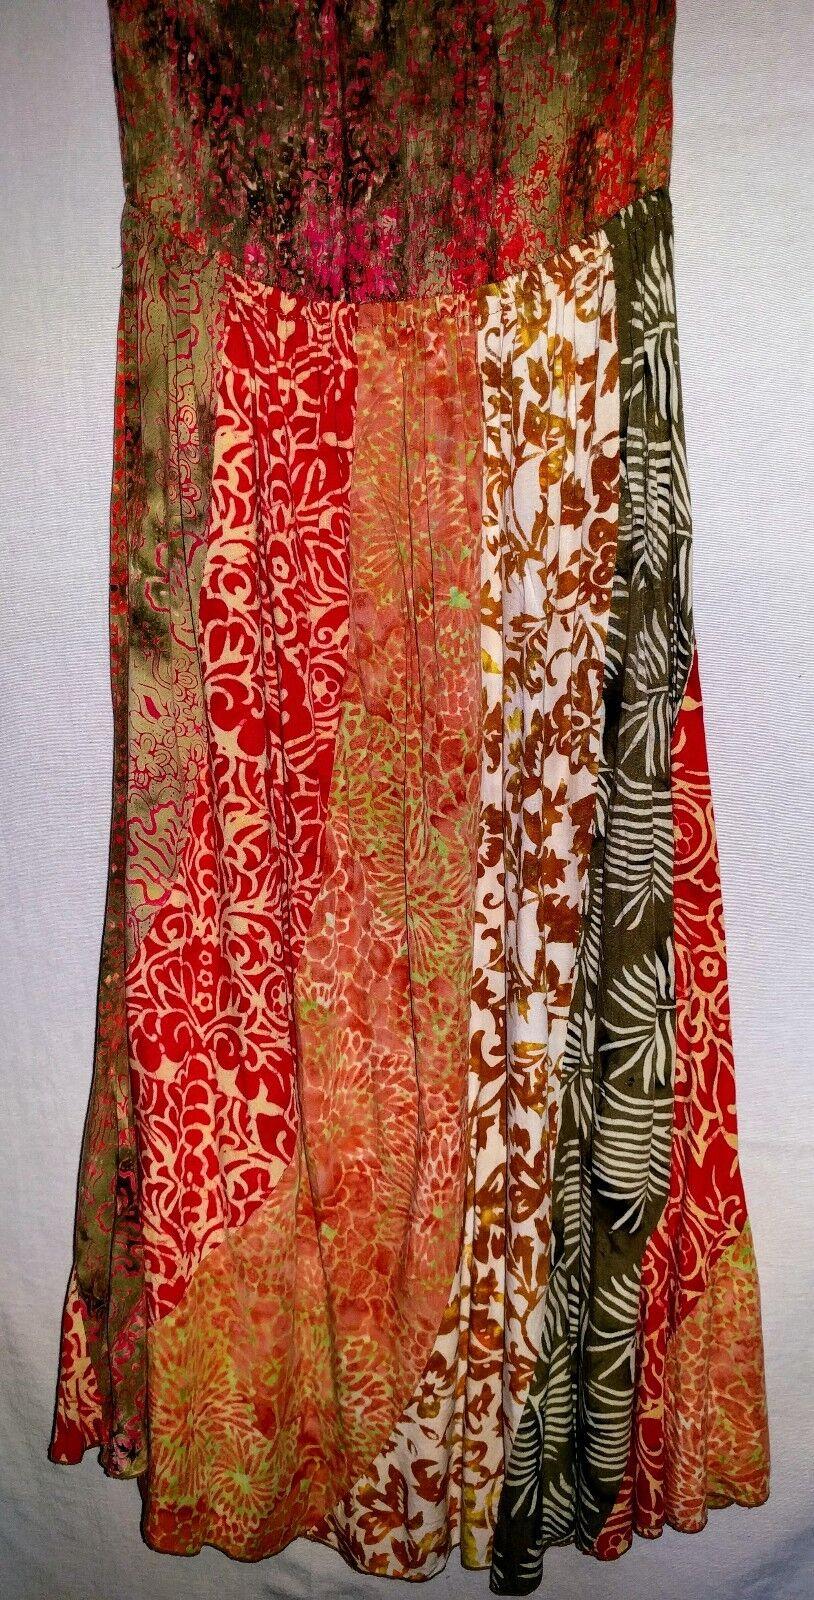 Santiki Small Dress Vintage Tiki Print Sari Strapless Sun Dress like Jams World